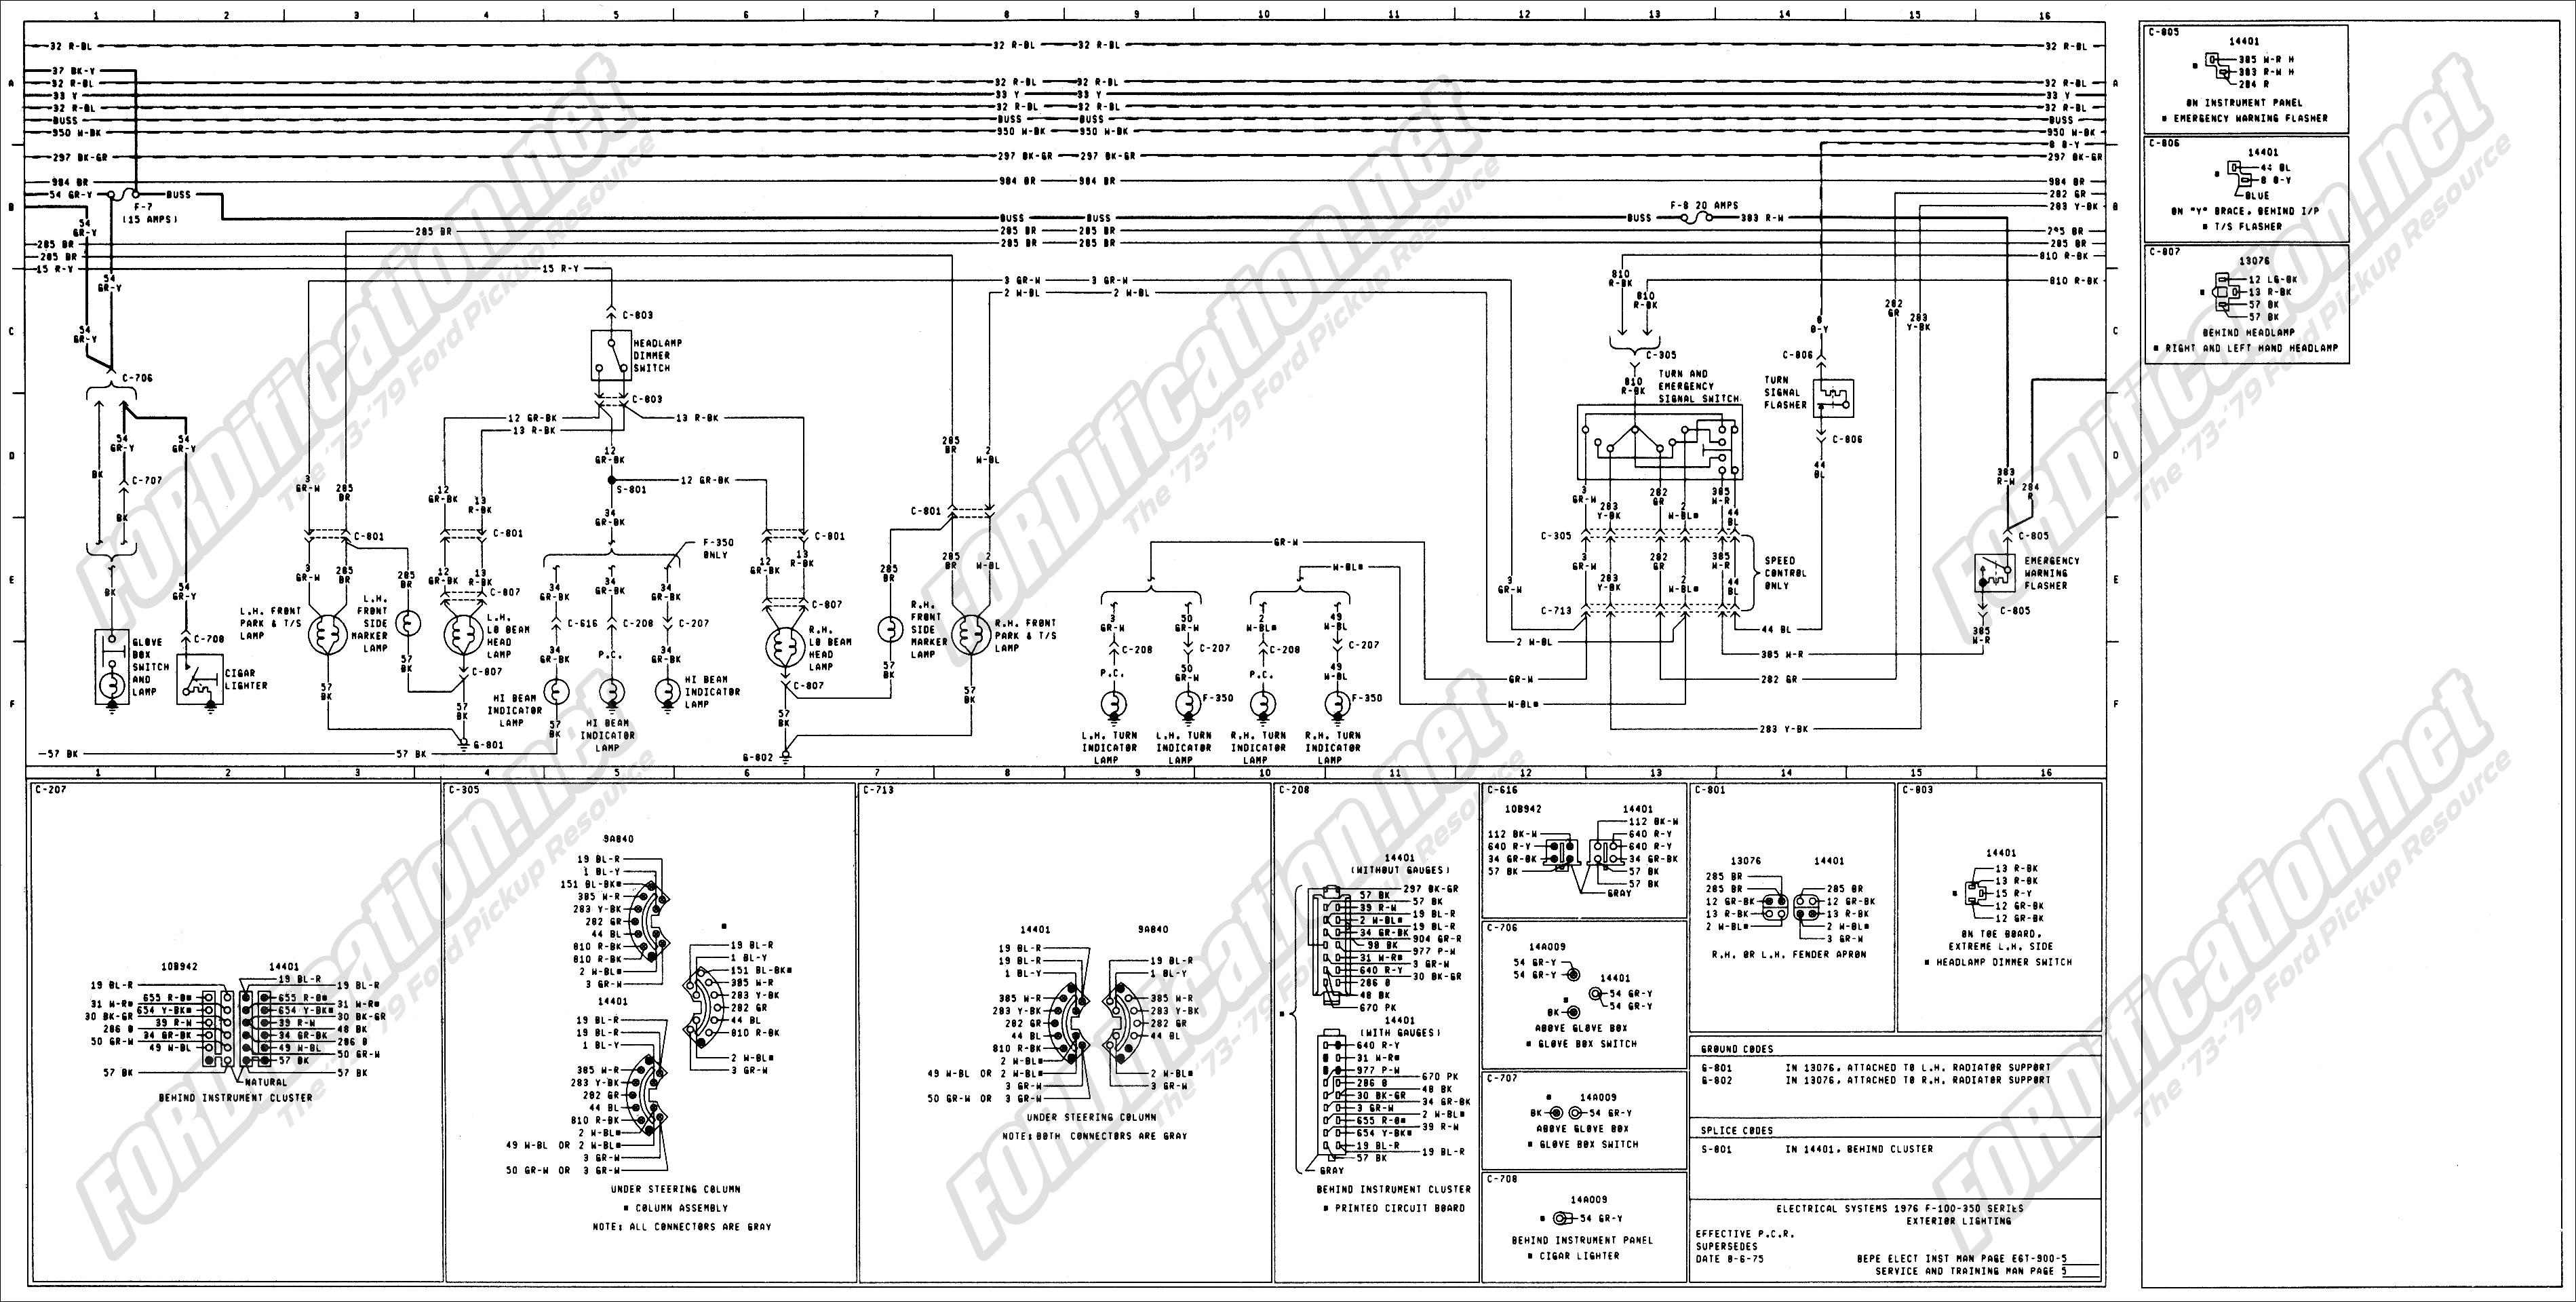 Pleasant 1967 Ford F 250 Wiring Diagram Basic Electronics Wiring Diagram Wiring Cloud Apomsimijknierdonabenoleattemohammedshrineorg